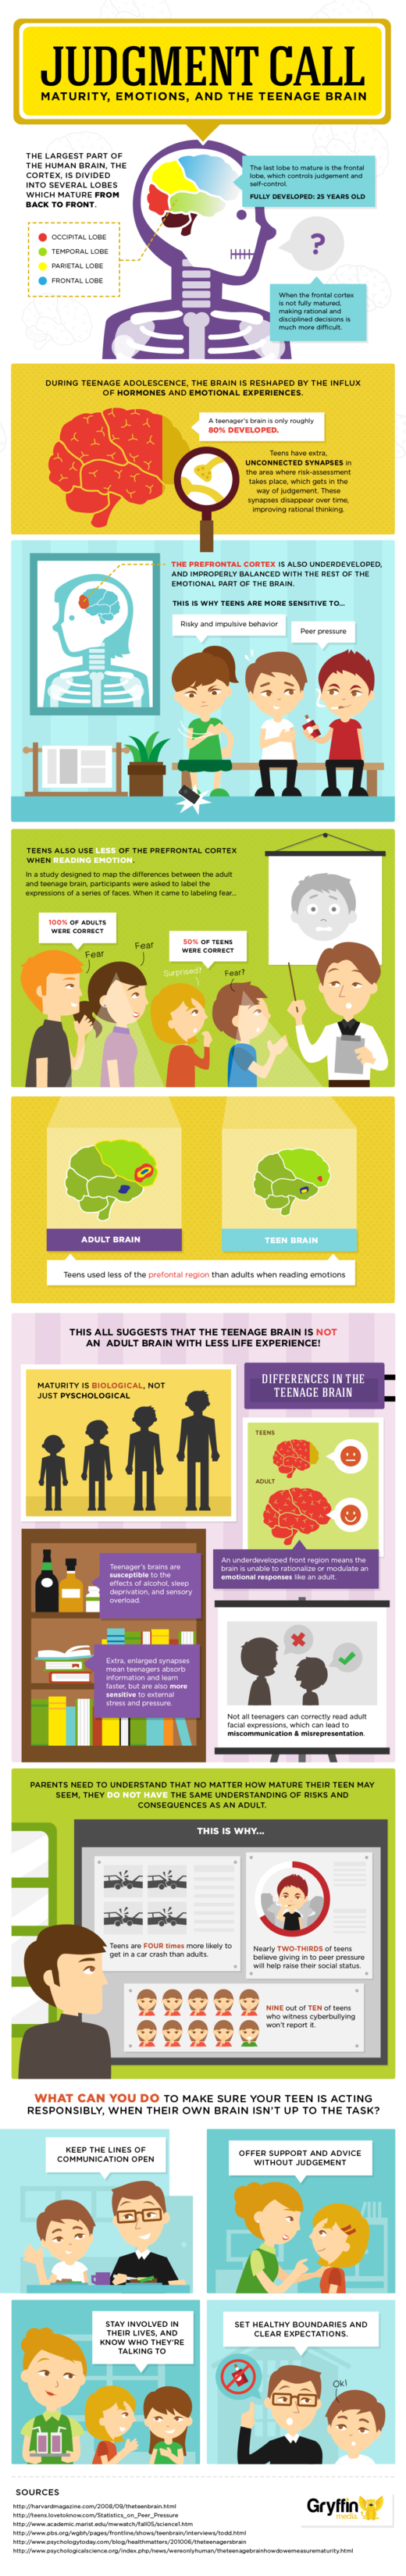 Judgementcall_Infographic